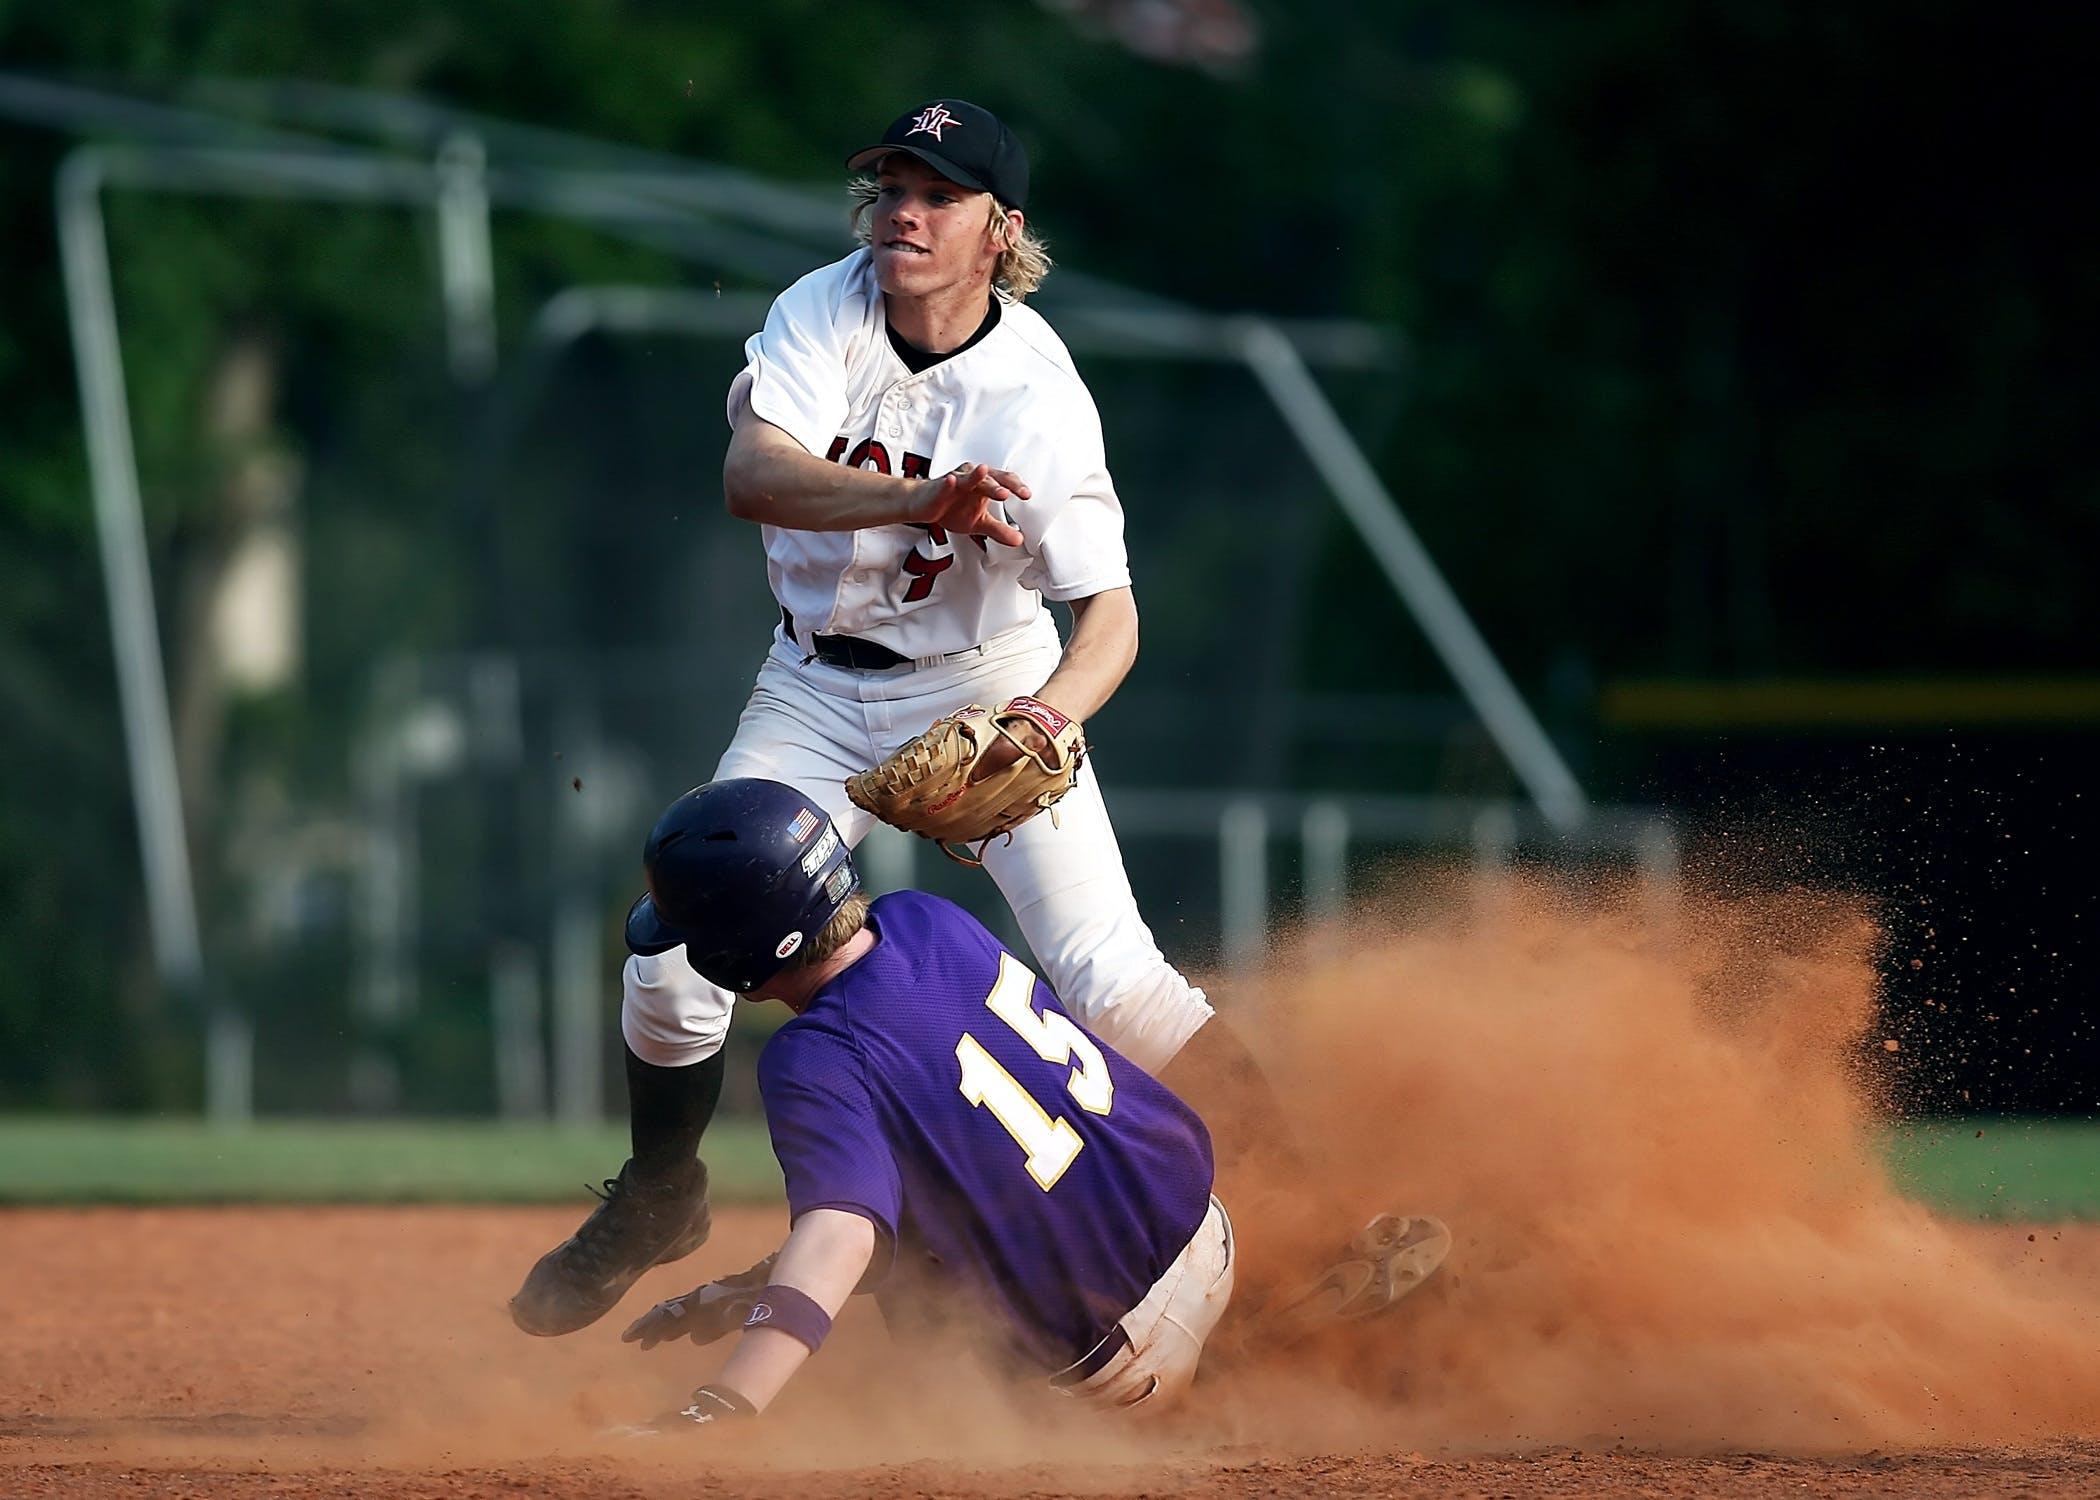 Kostenloses Stock Foto zu athleten, baseball, baseball-spieler, handschuh